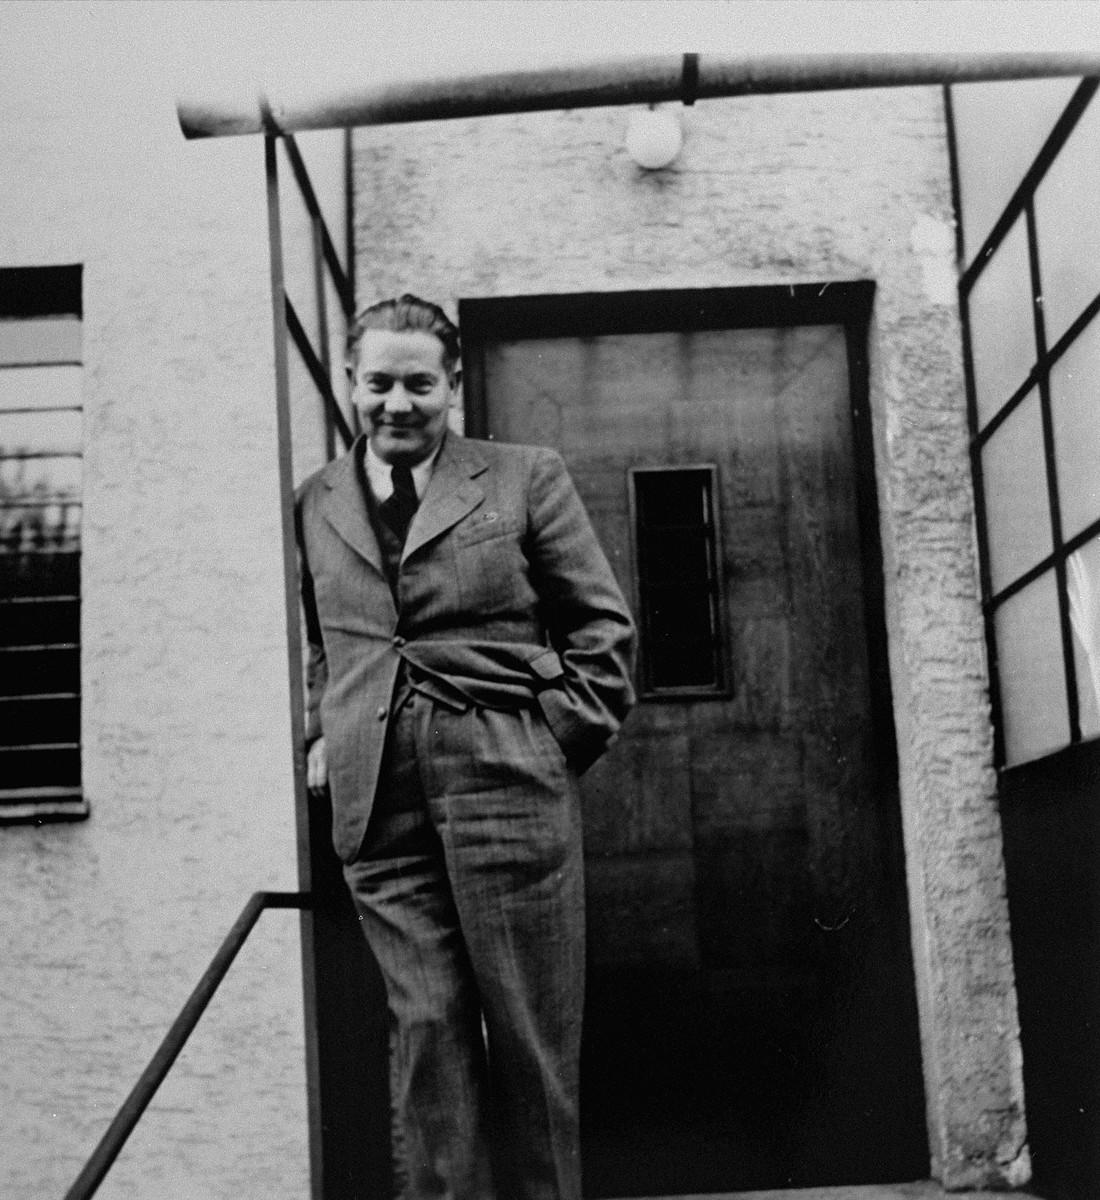 Portrait of Dr. Joseph Jaksy standing at the entrance to a building.